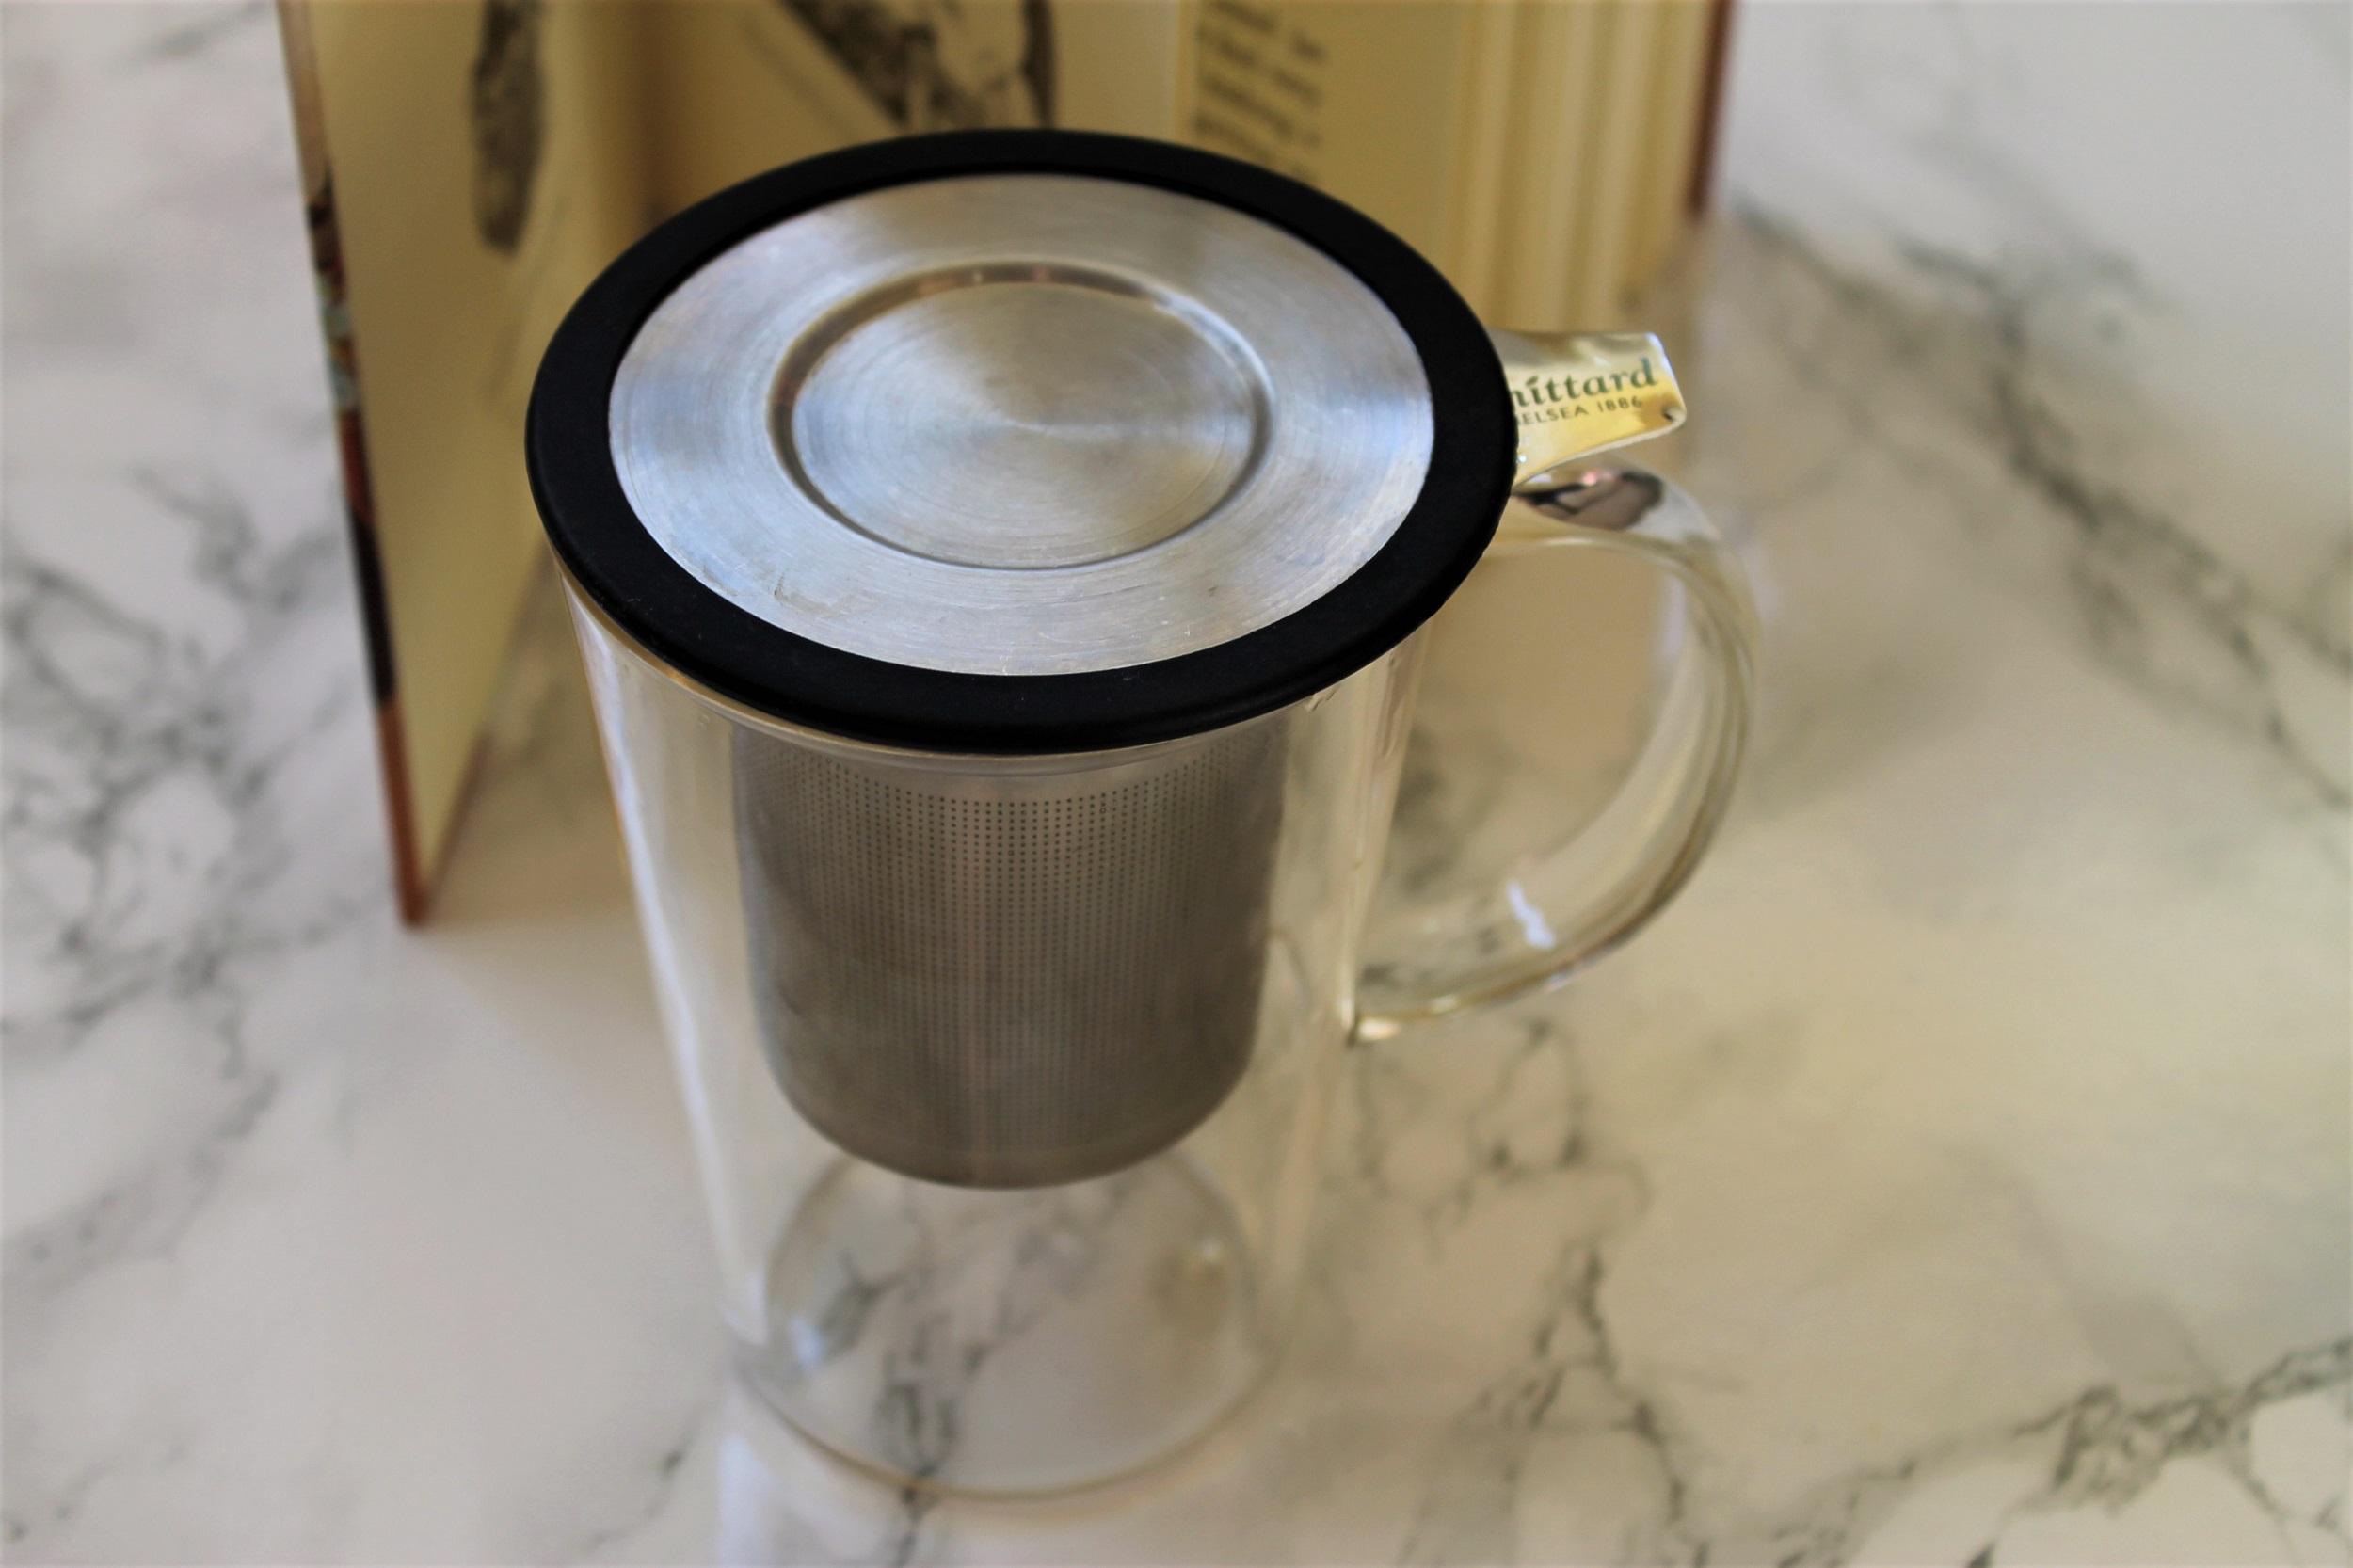 whittard pao glass mug